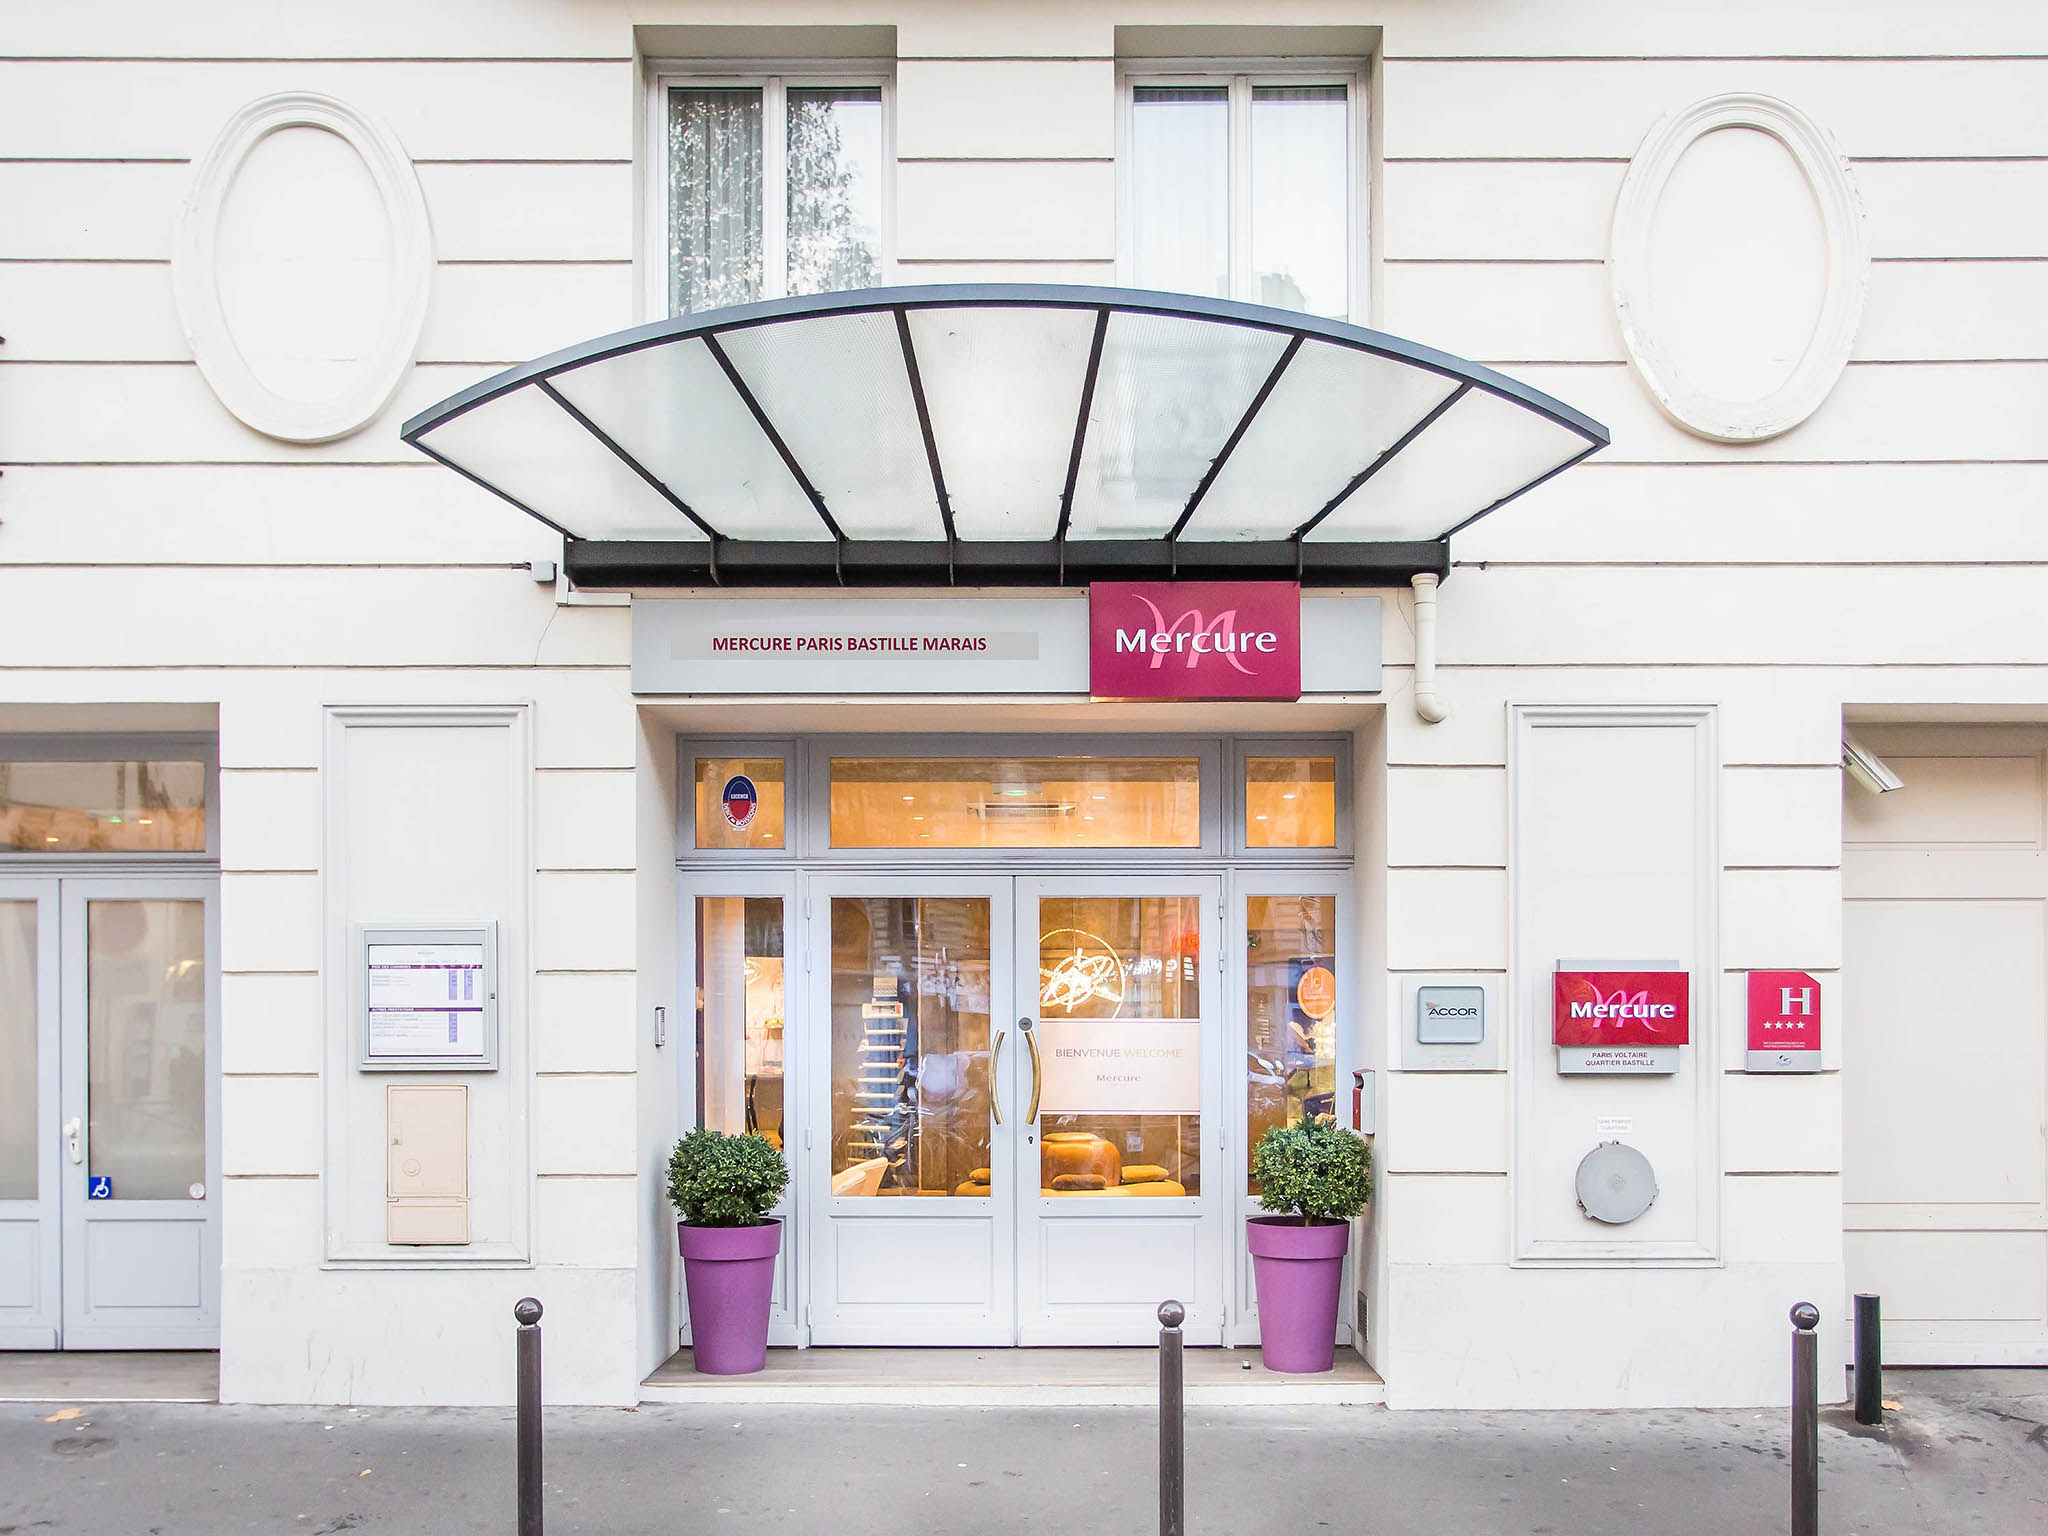 Hotel Mercure Paris Bastille Marais